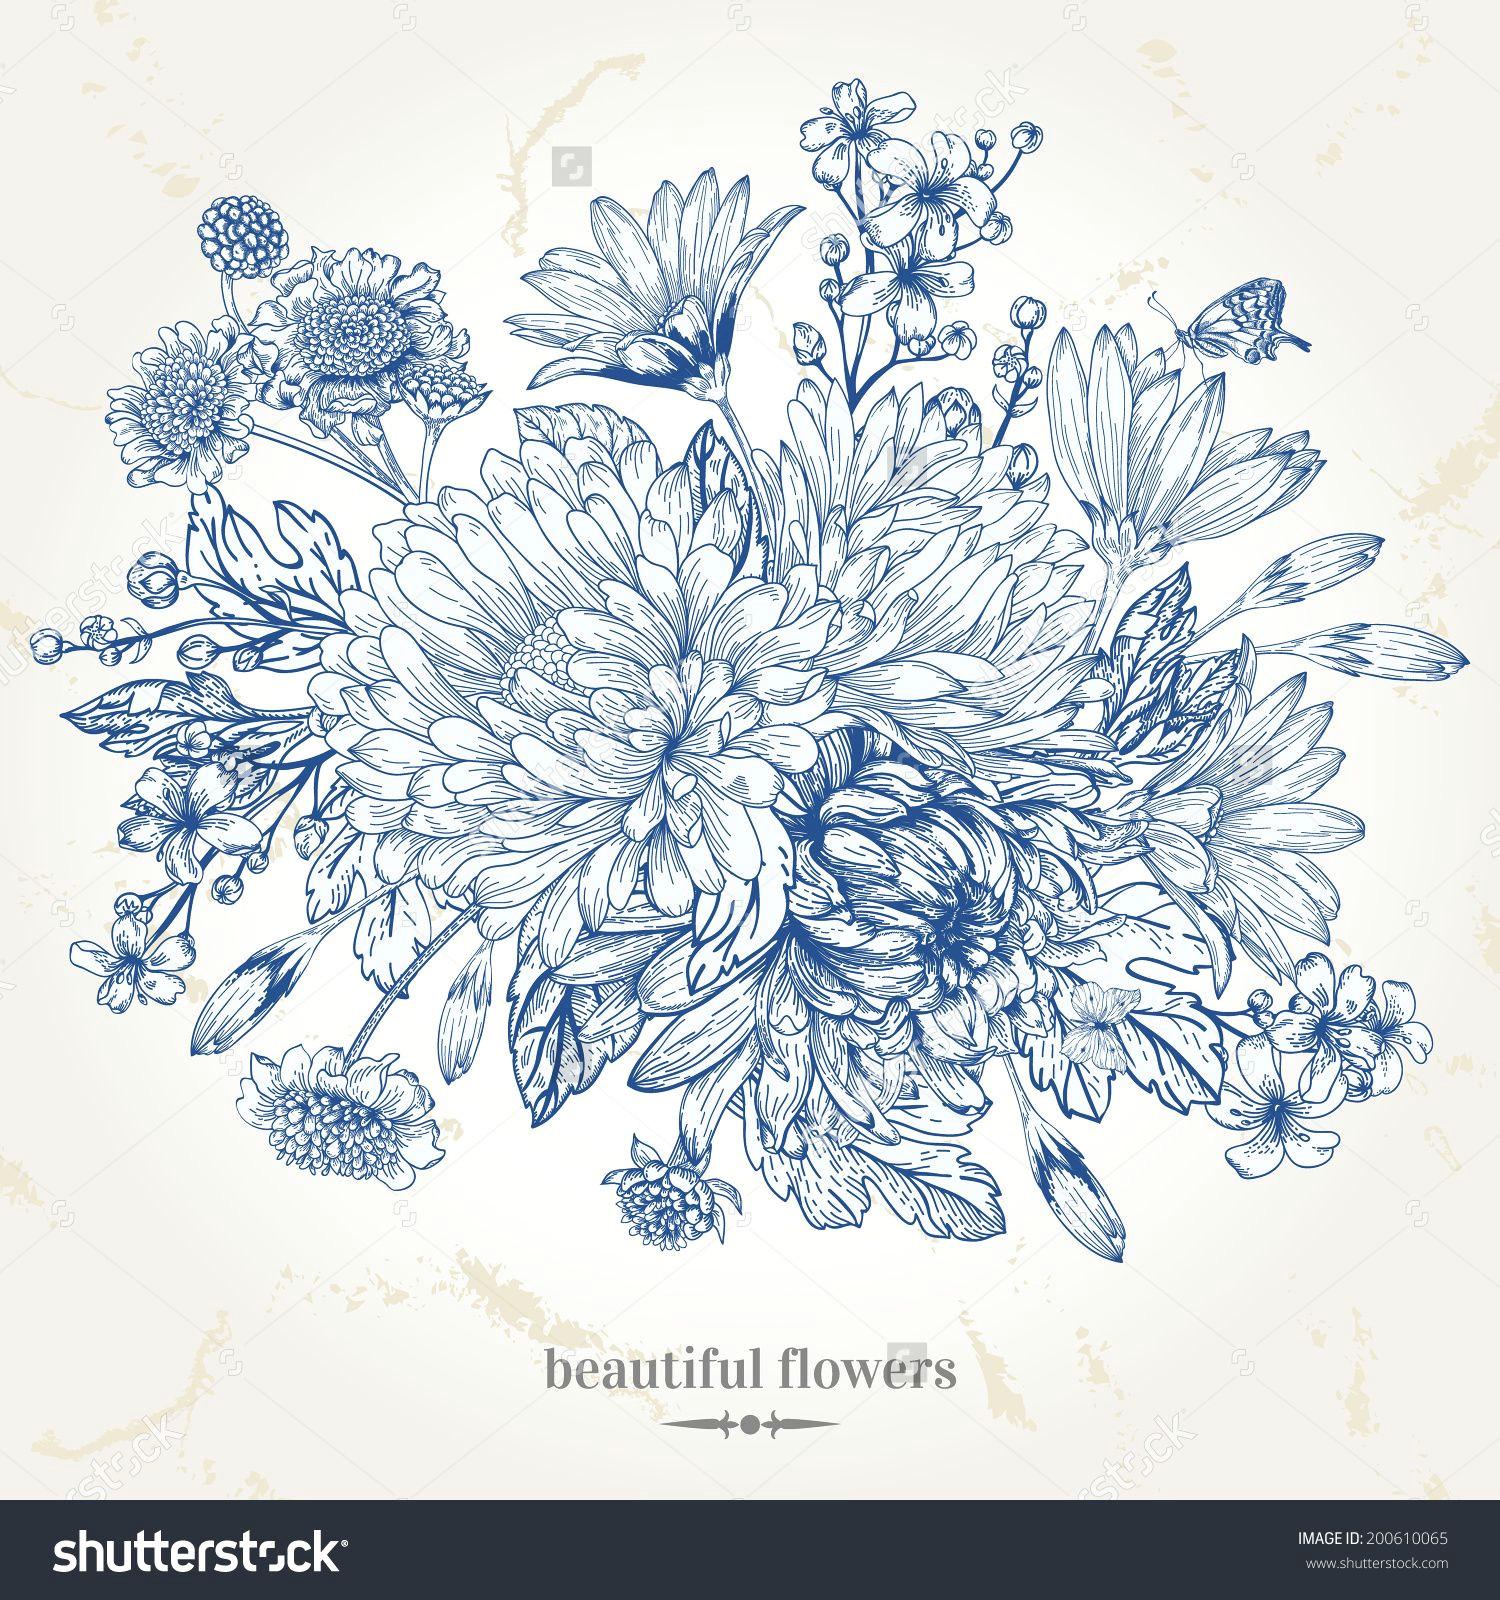 how to draw hands pencil drawings art drawings botanical art botanical drawings